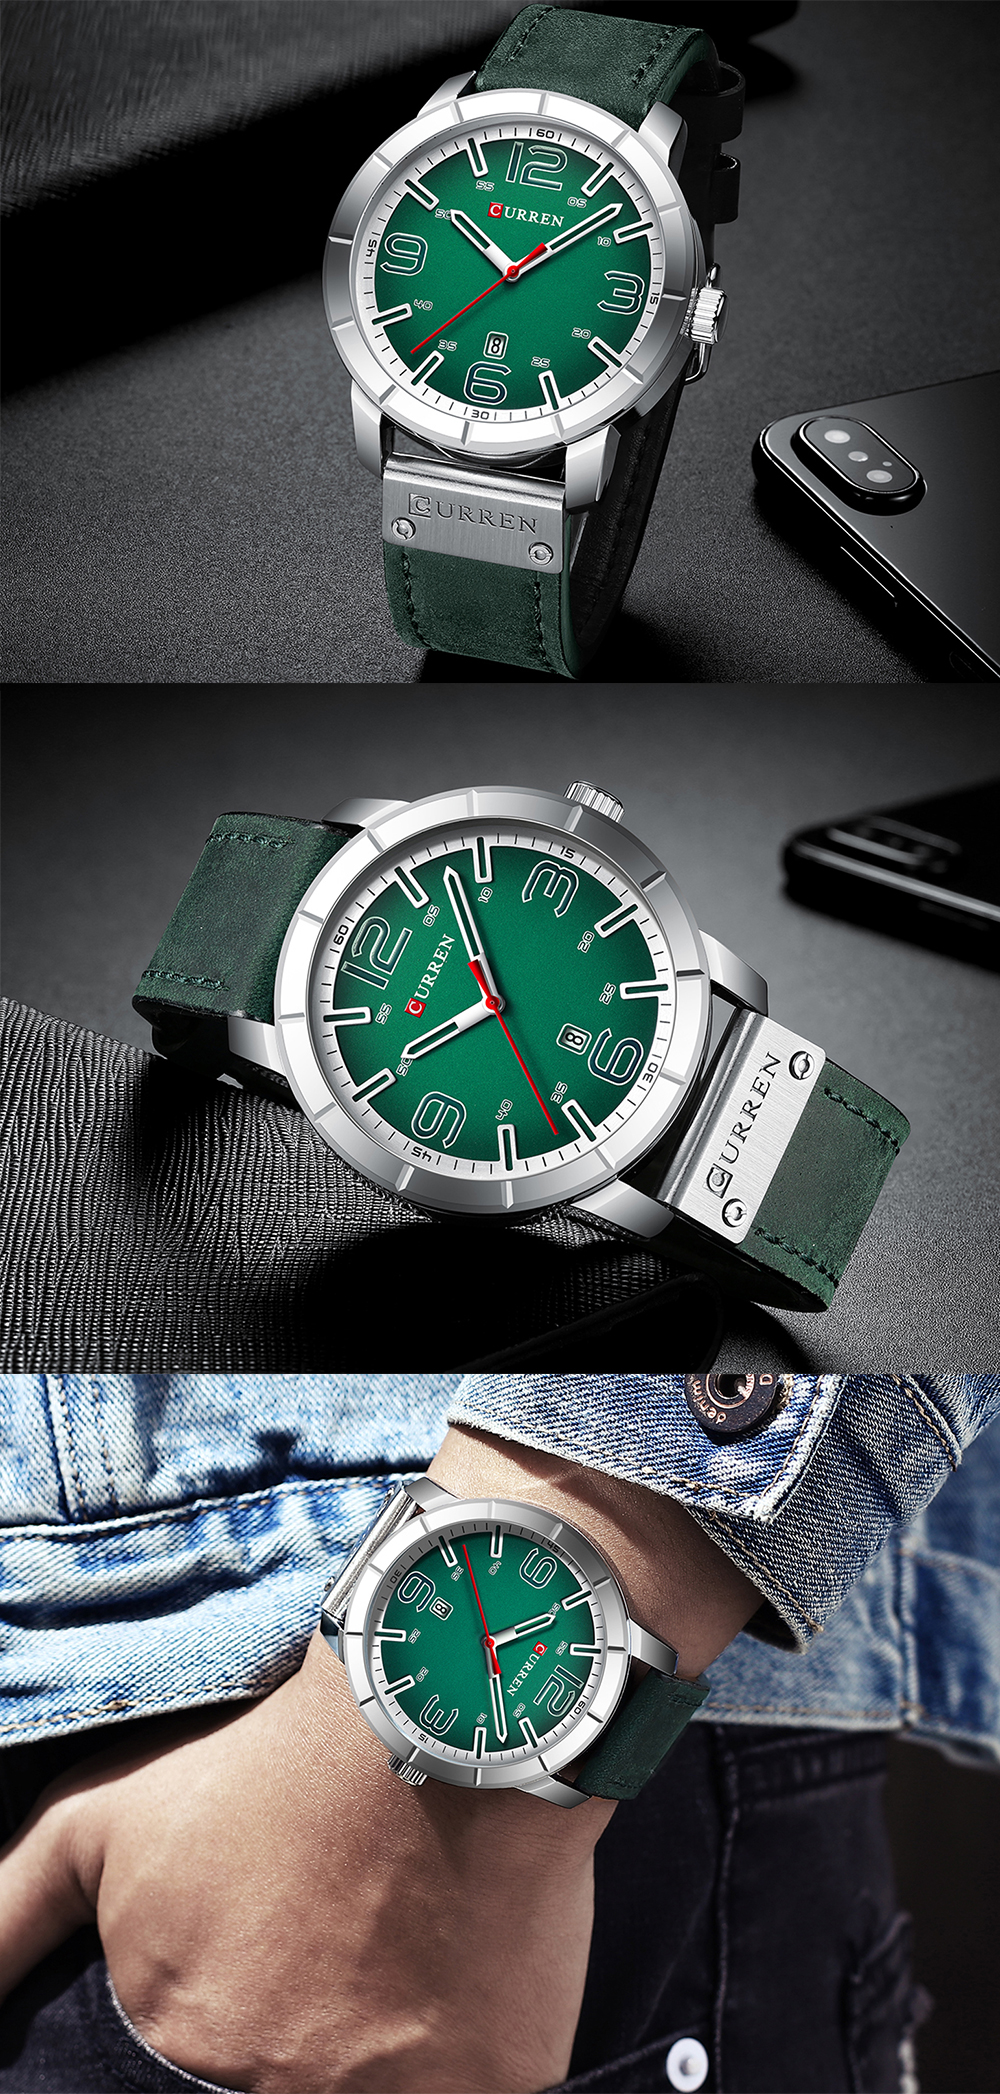 HTB1HFc aPzuK1RjSspeq6ziHVXaO Men Watch 2019 CURREN Men's Quartz Wristwatches Male Clock Top Brand Luxury Reloj Hombres Leather Wrist Watches with Calendar